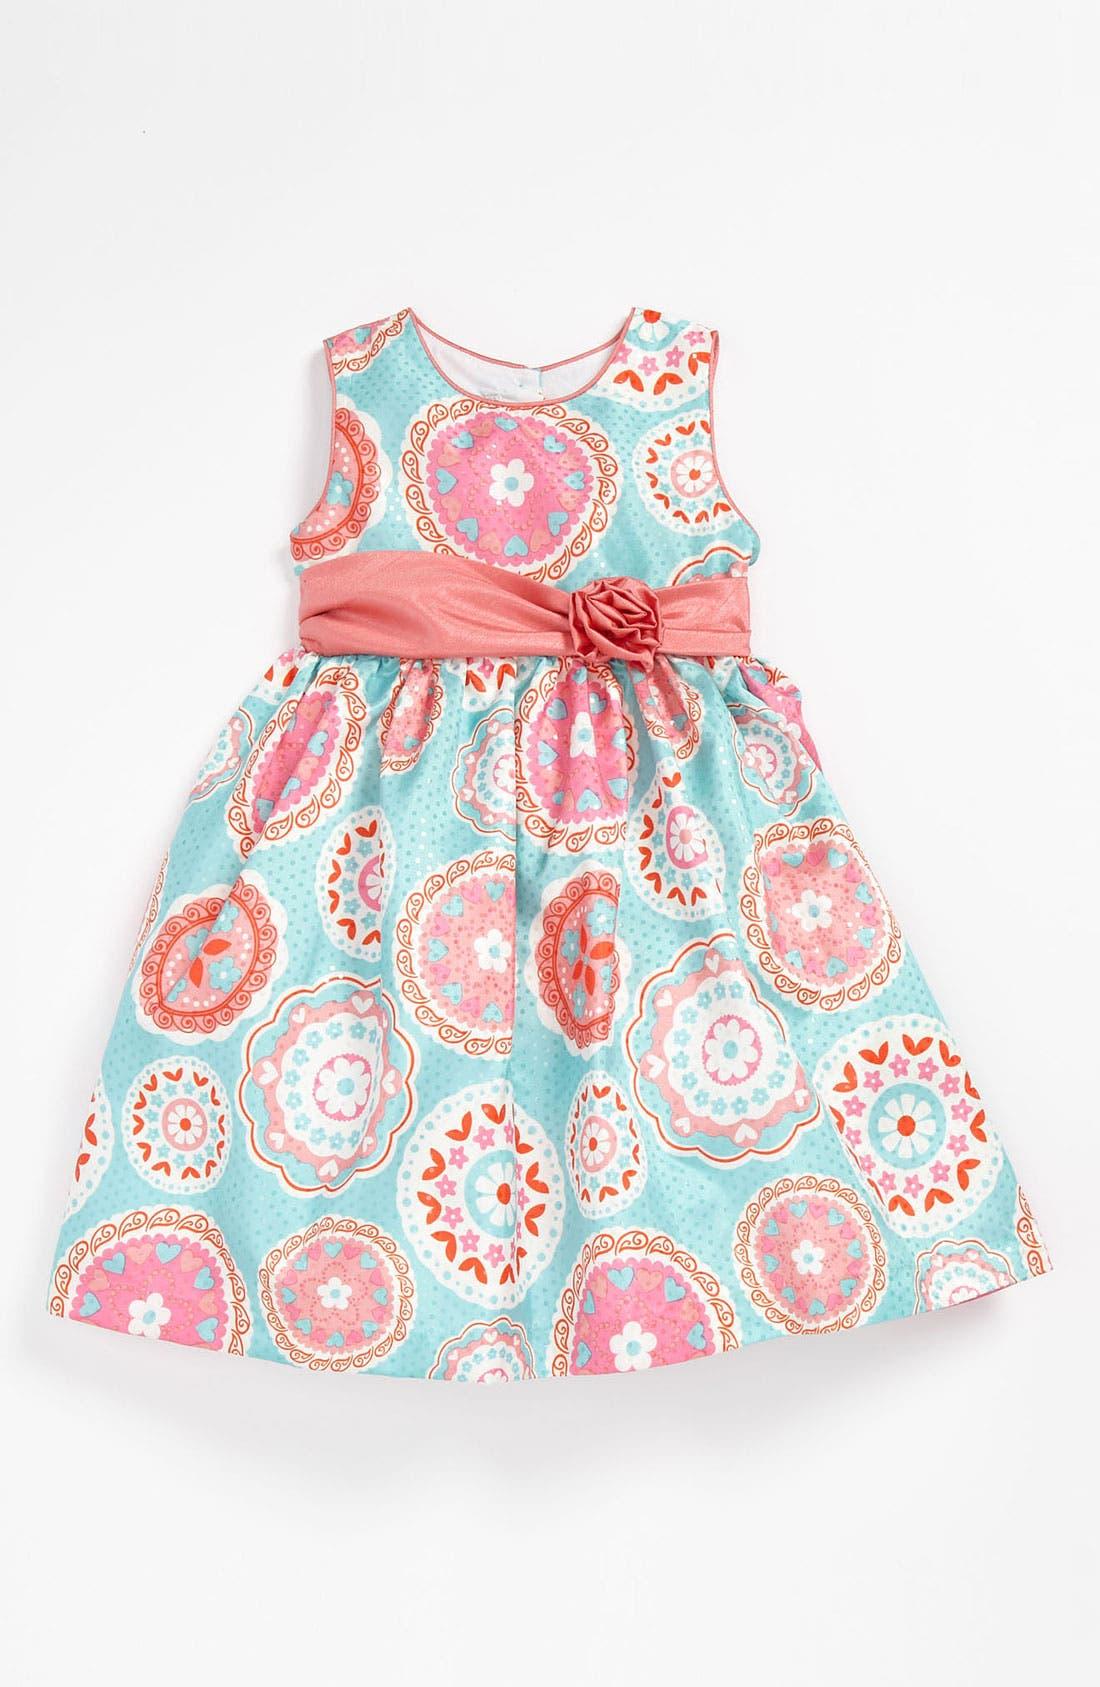 Main Image - Pippa & Julie Medallion Print Dress (Toddler)